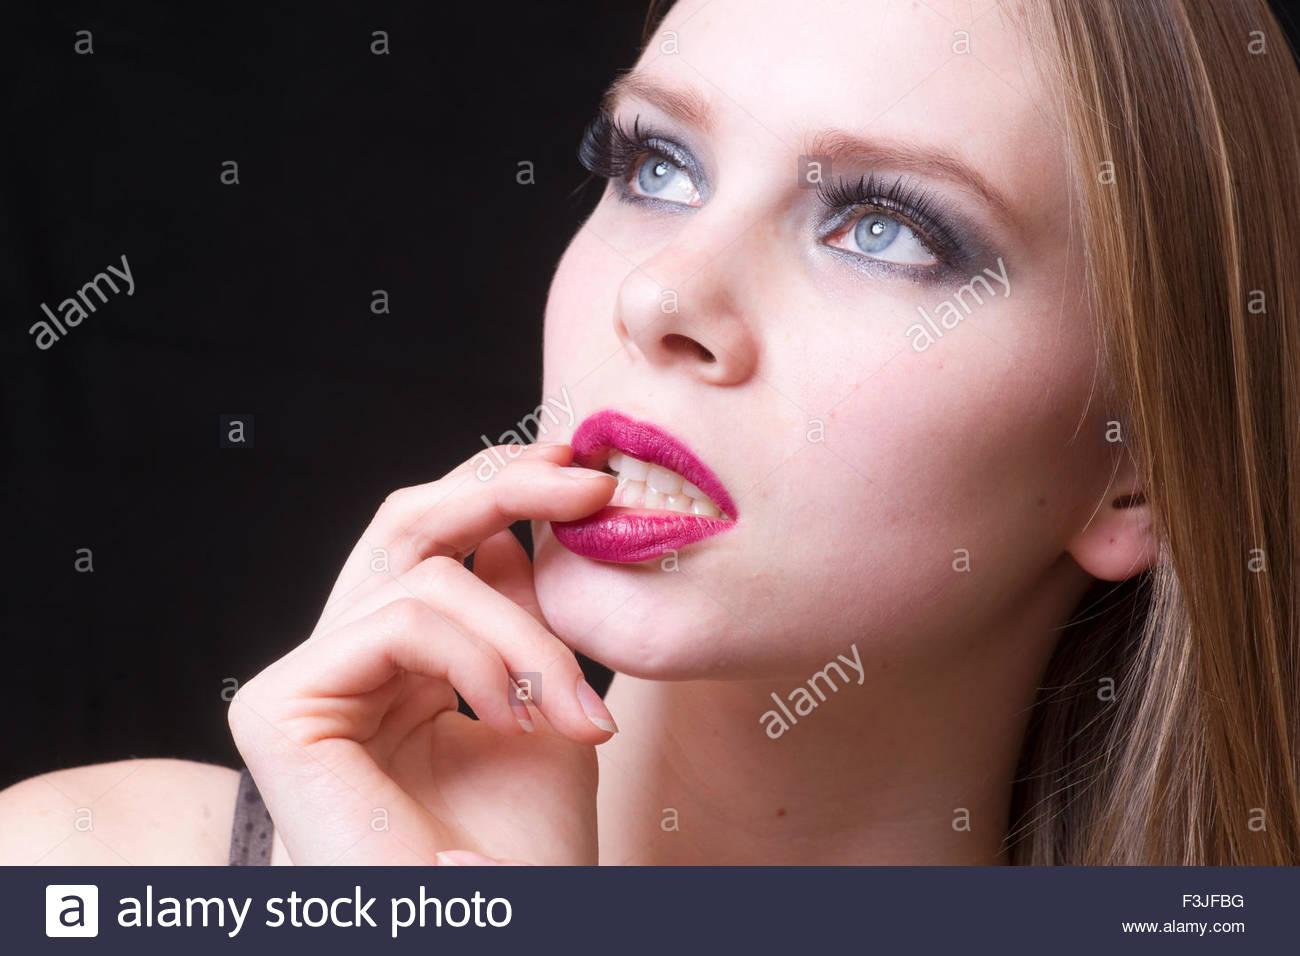 Young Woman's Hand Touching Mouth Studio Shot - Stock Image